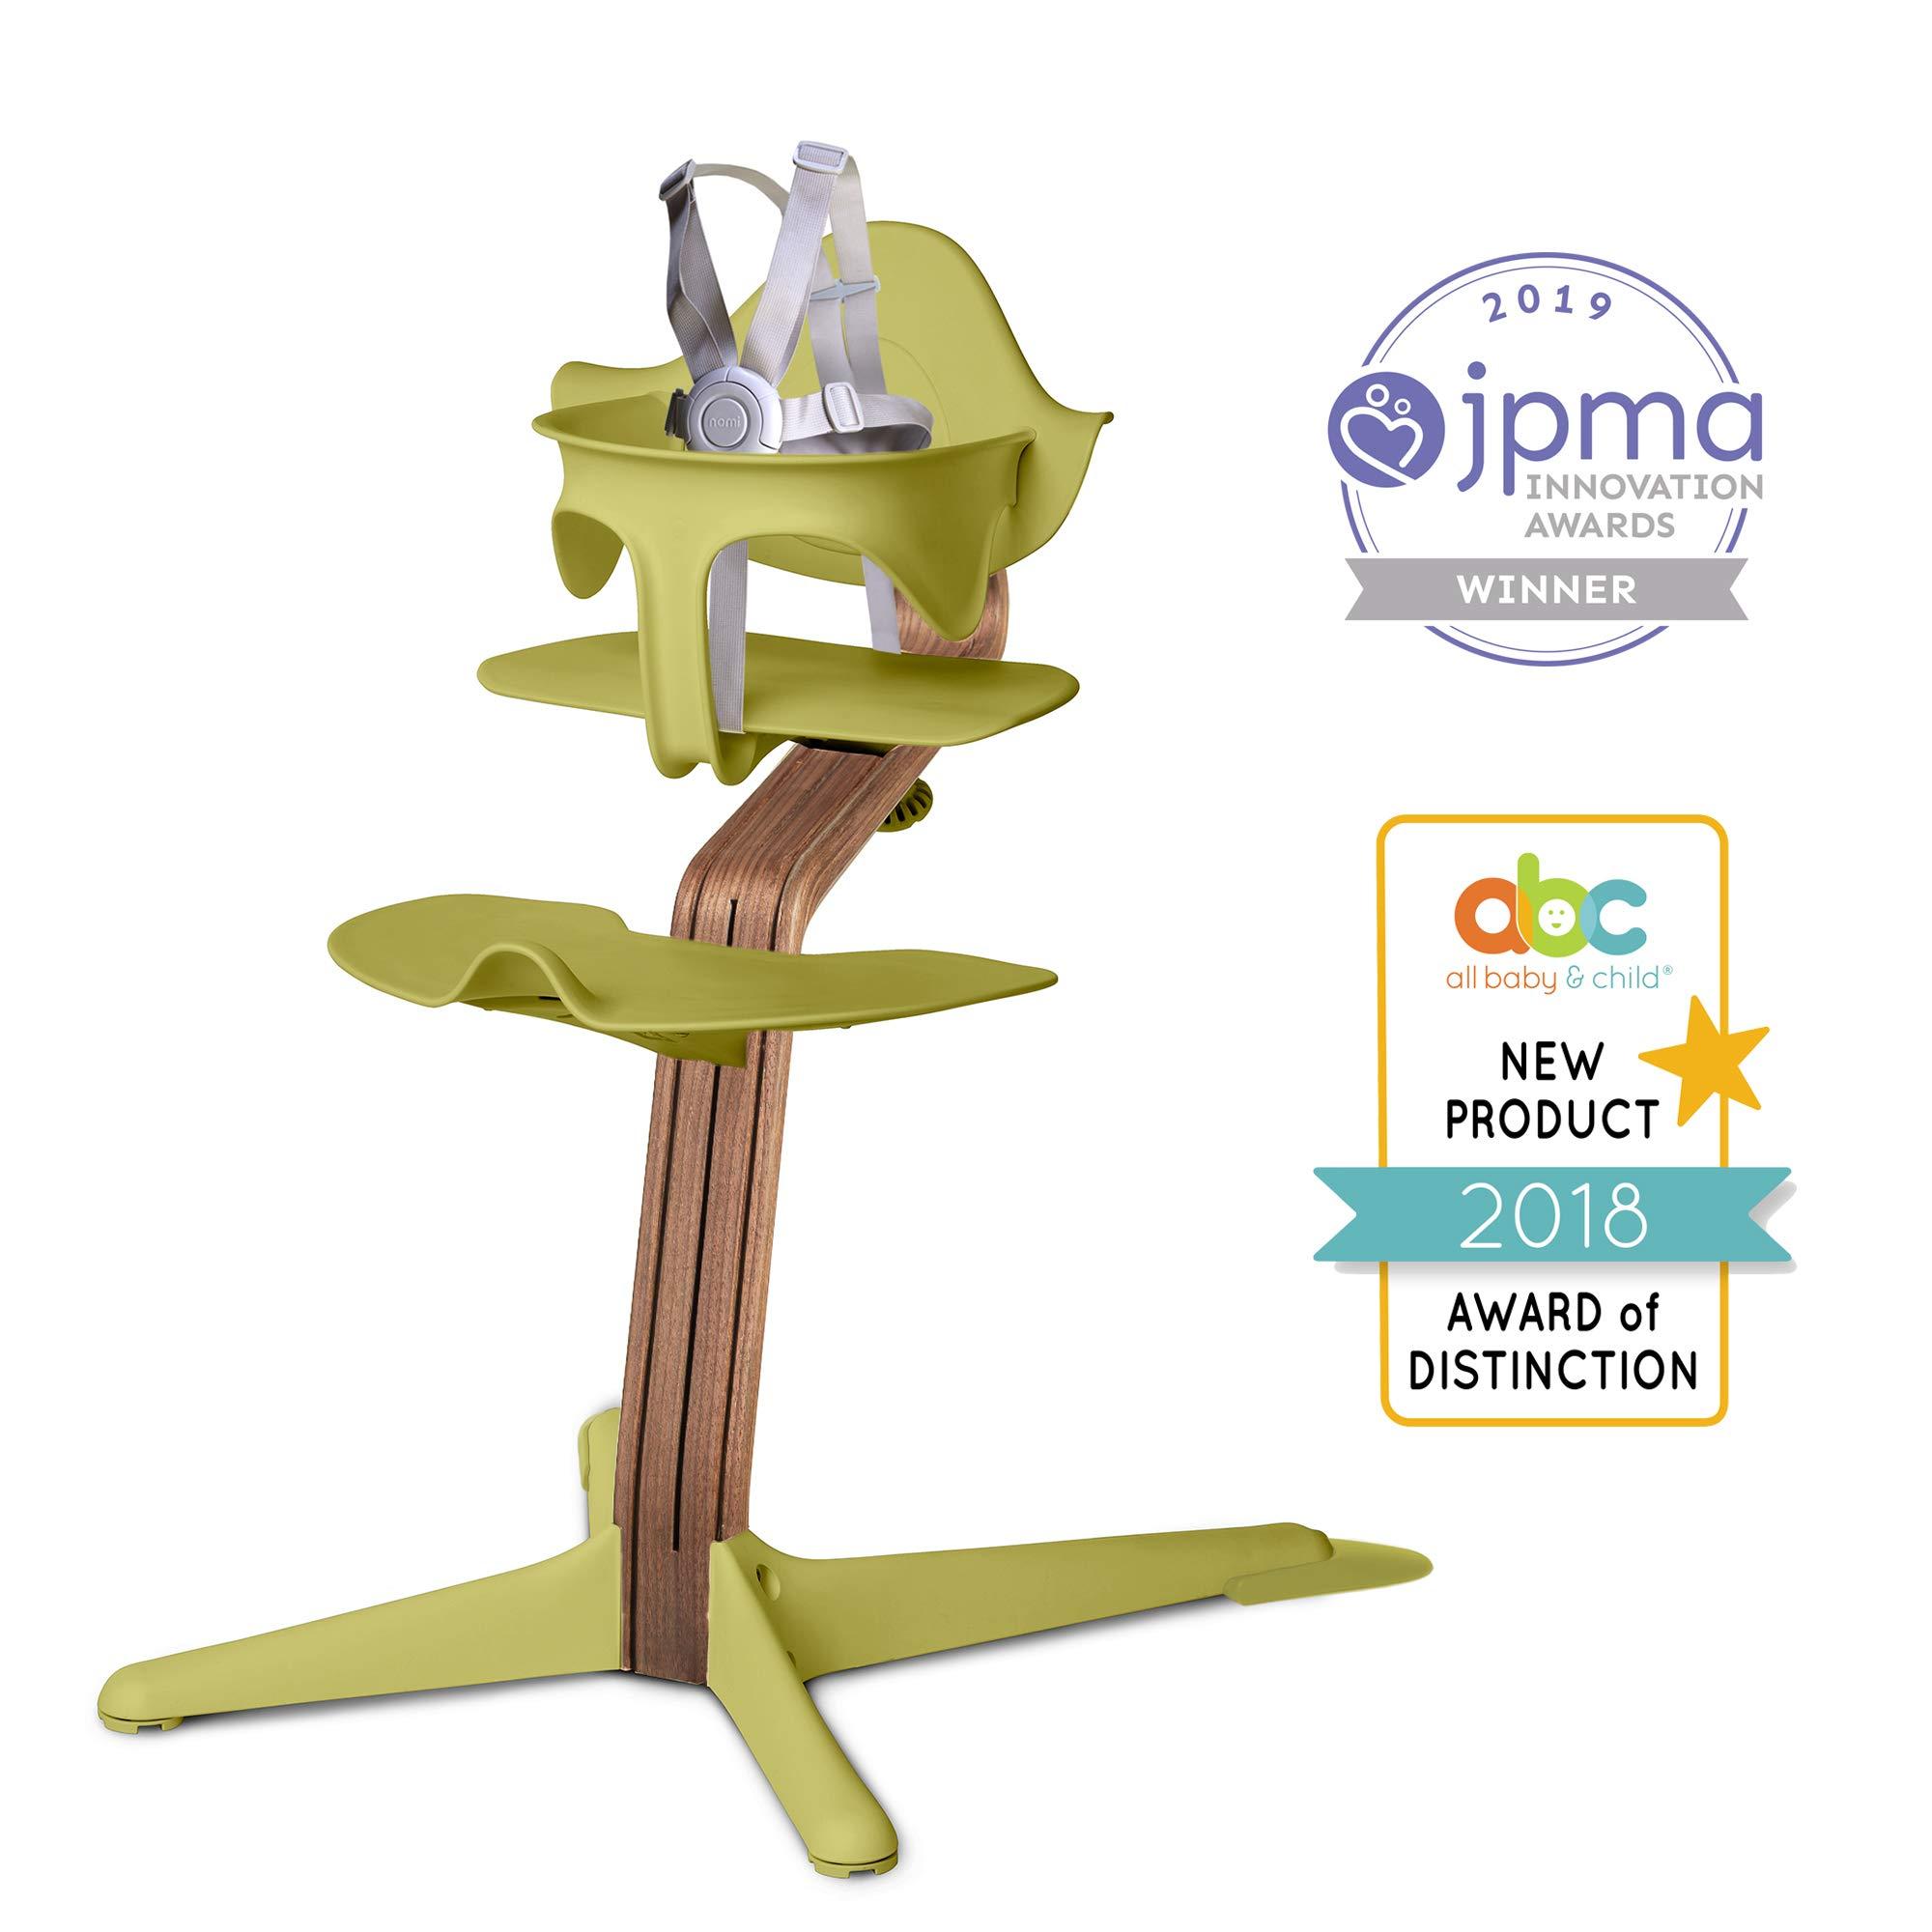 Nomi High Chair, Lime – Premium Walnut Wood, Modern Scandinavian Design with a Strong Wooden Stem, Baby through Teenager and Beyond with Seamless Adjustability, Award Winning Highchair